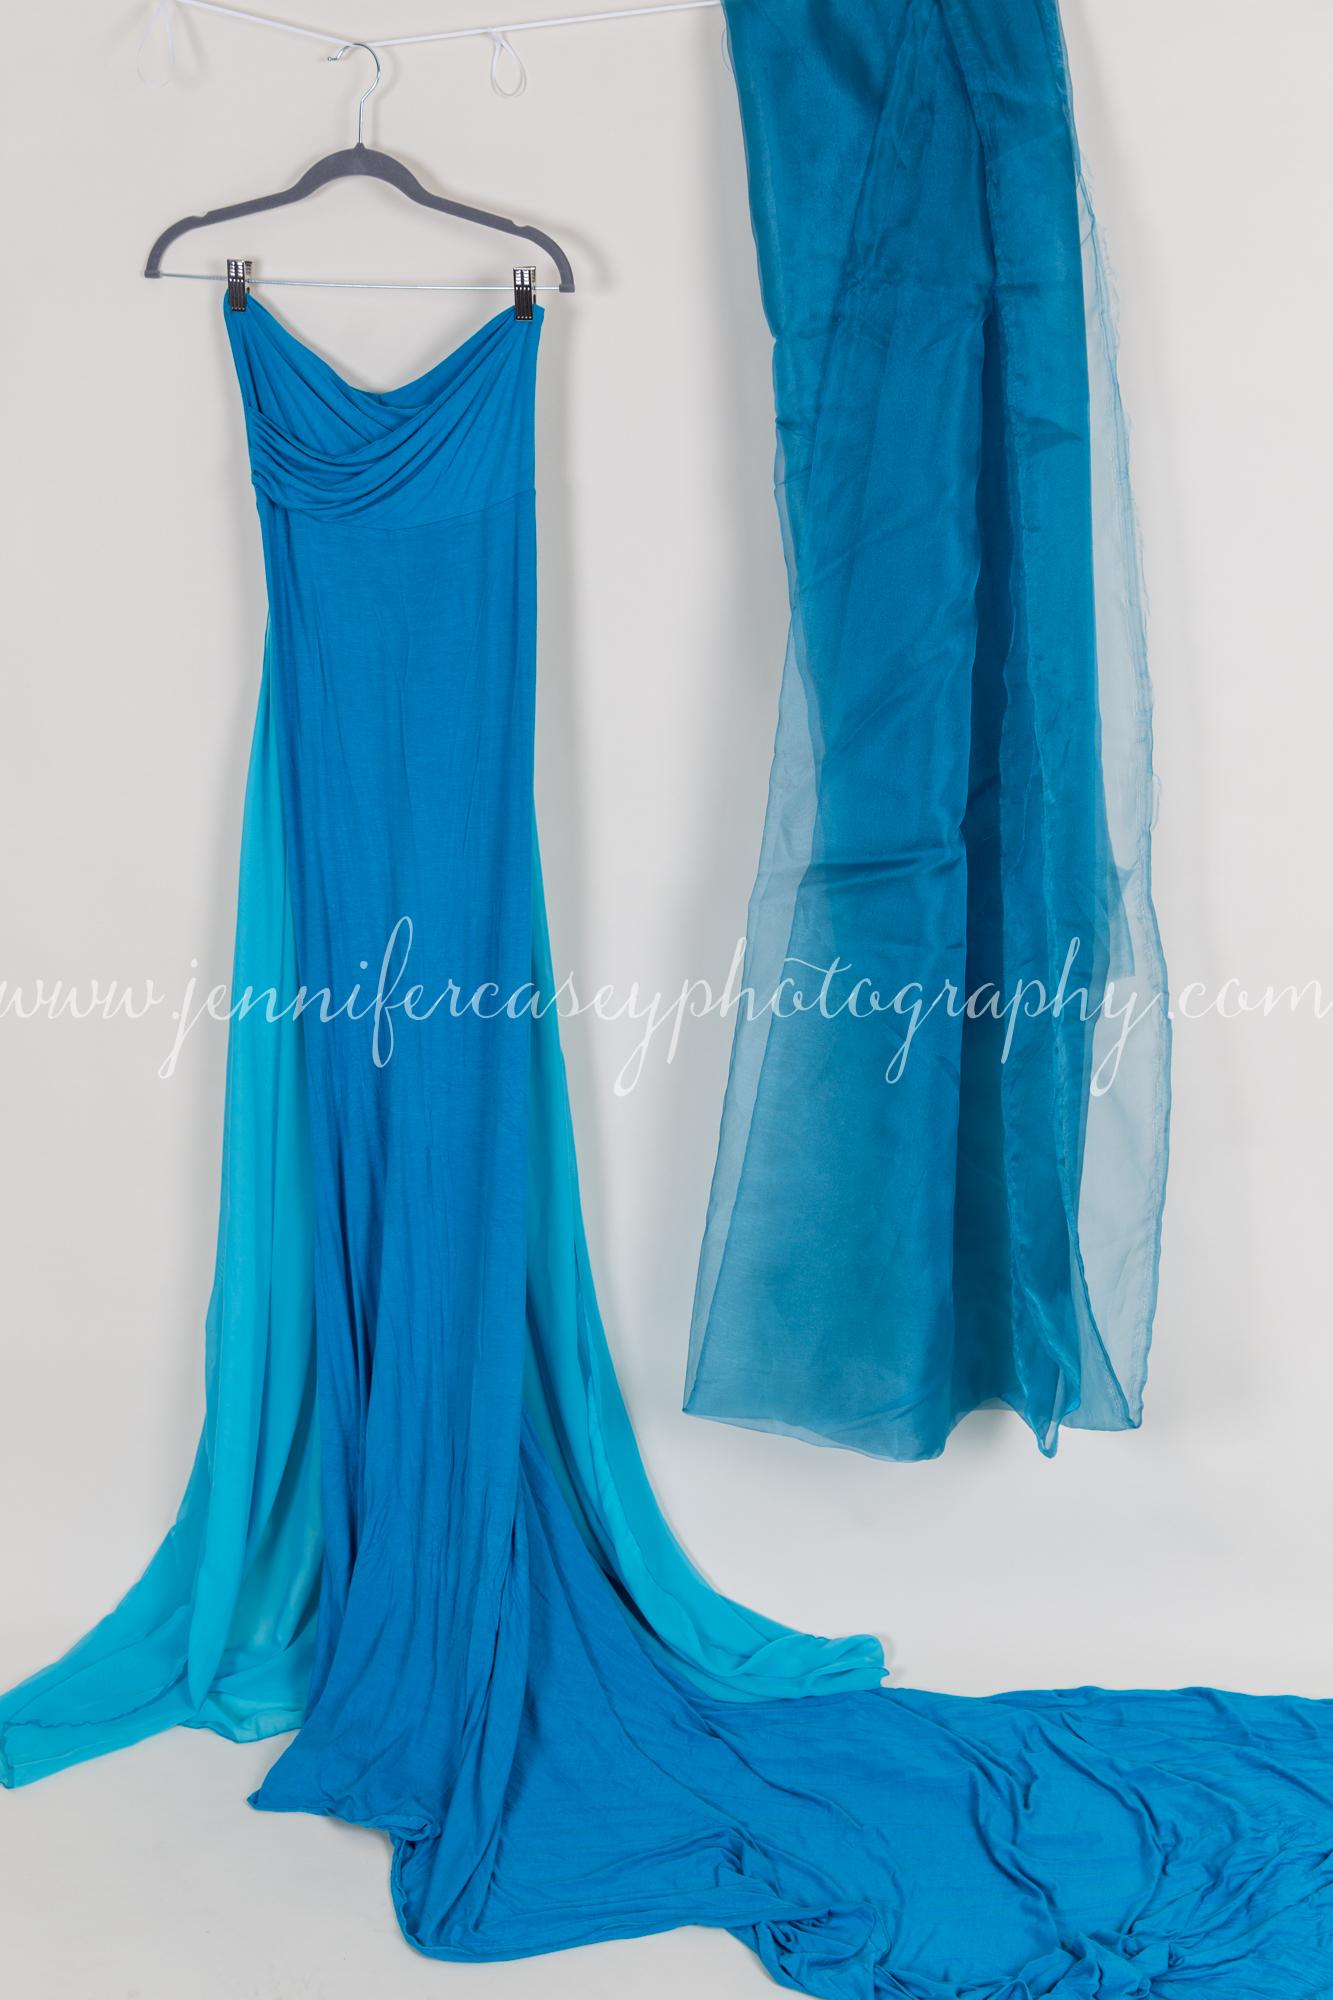 Studio Props Maternity Dresses-11.jpg